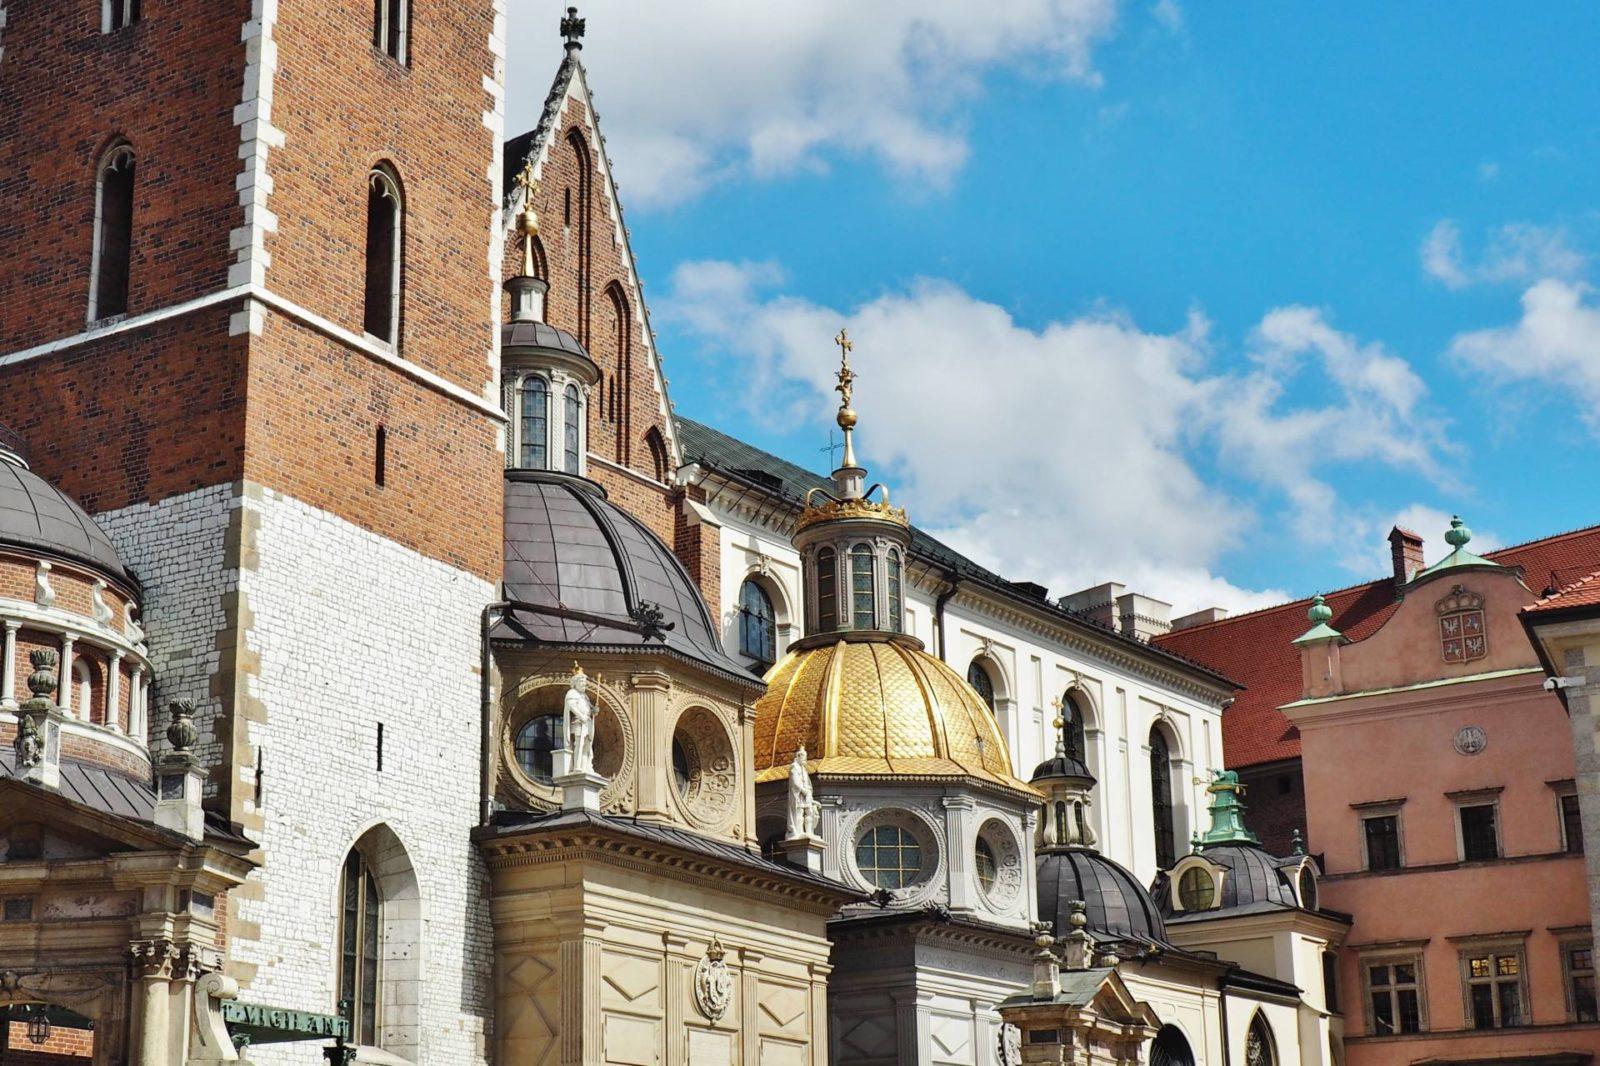 Emma Victoria Stokes Wawel Castle Krakow